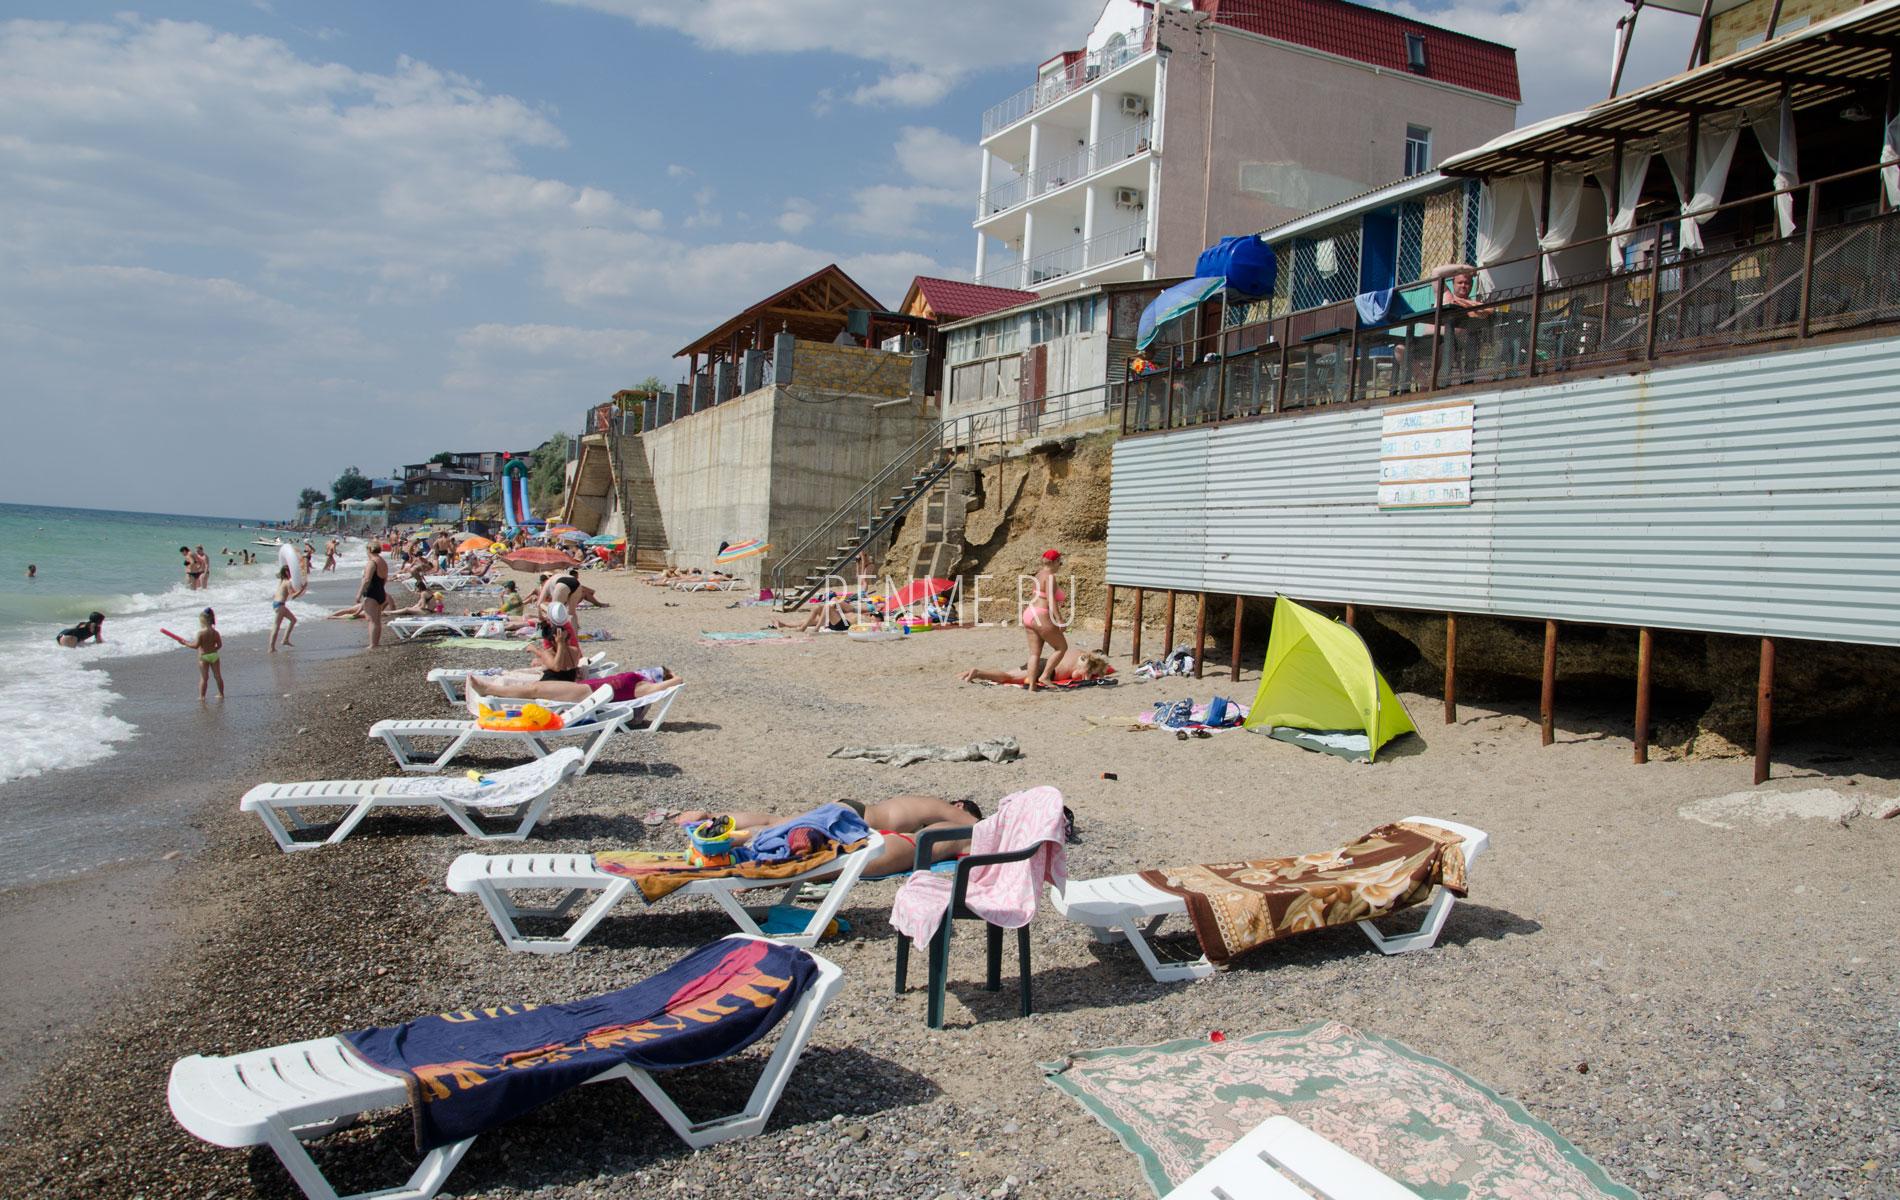 Пляжи Монтажник, Чайка. Фото Николаевки